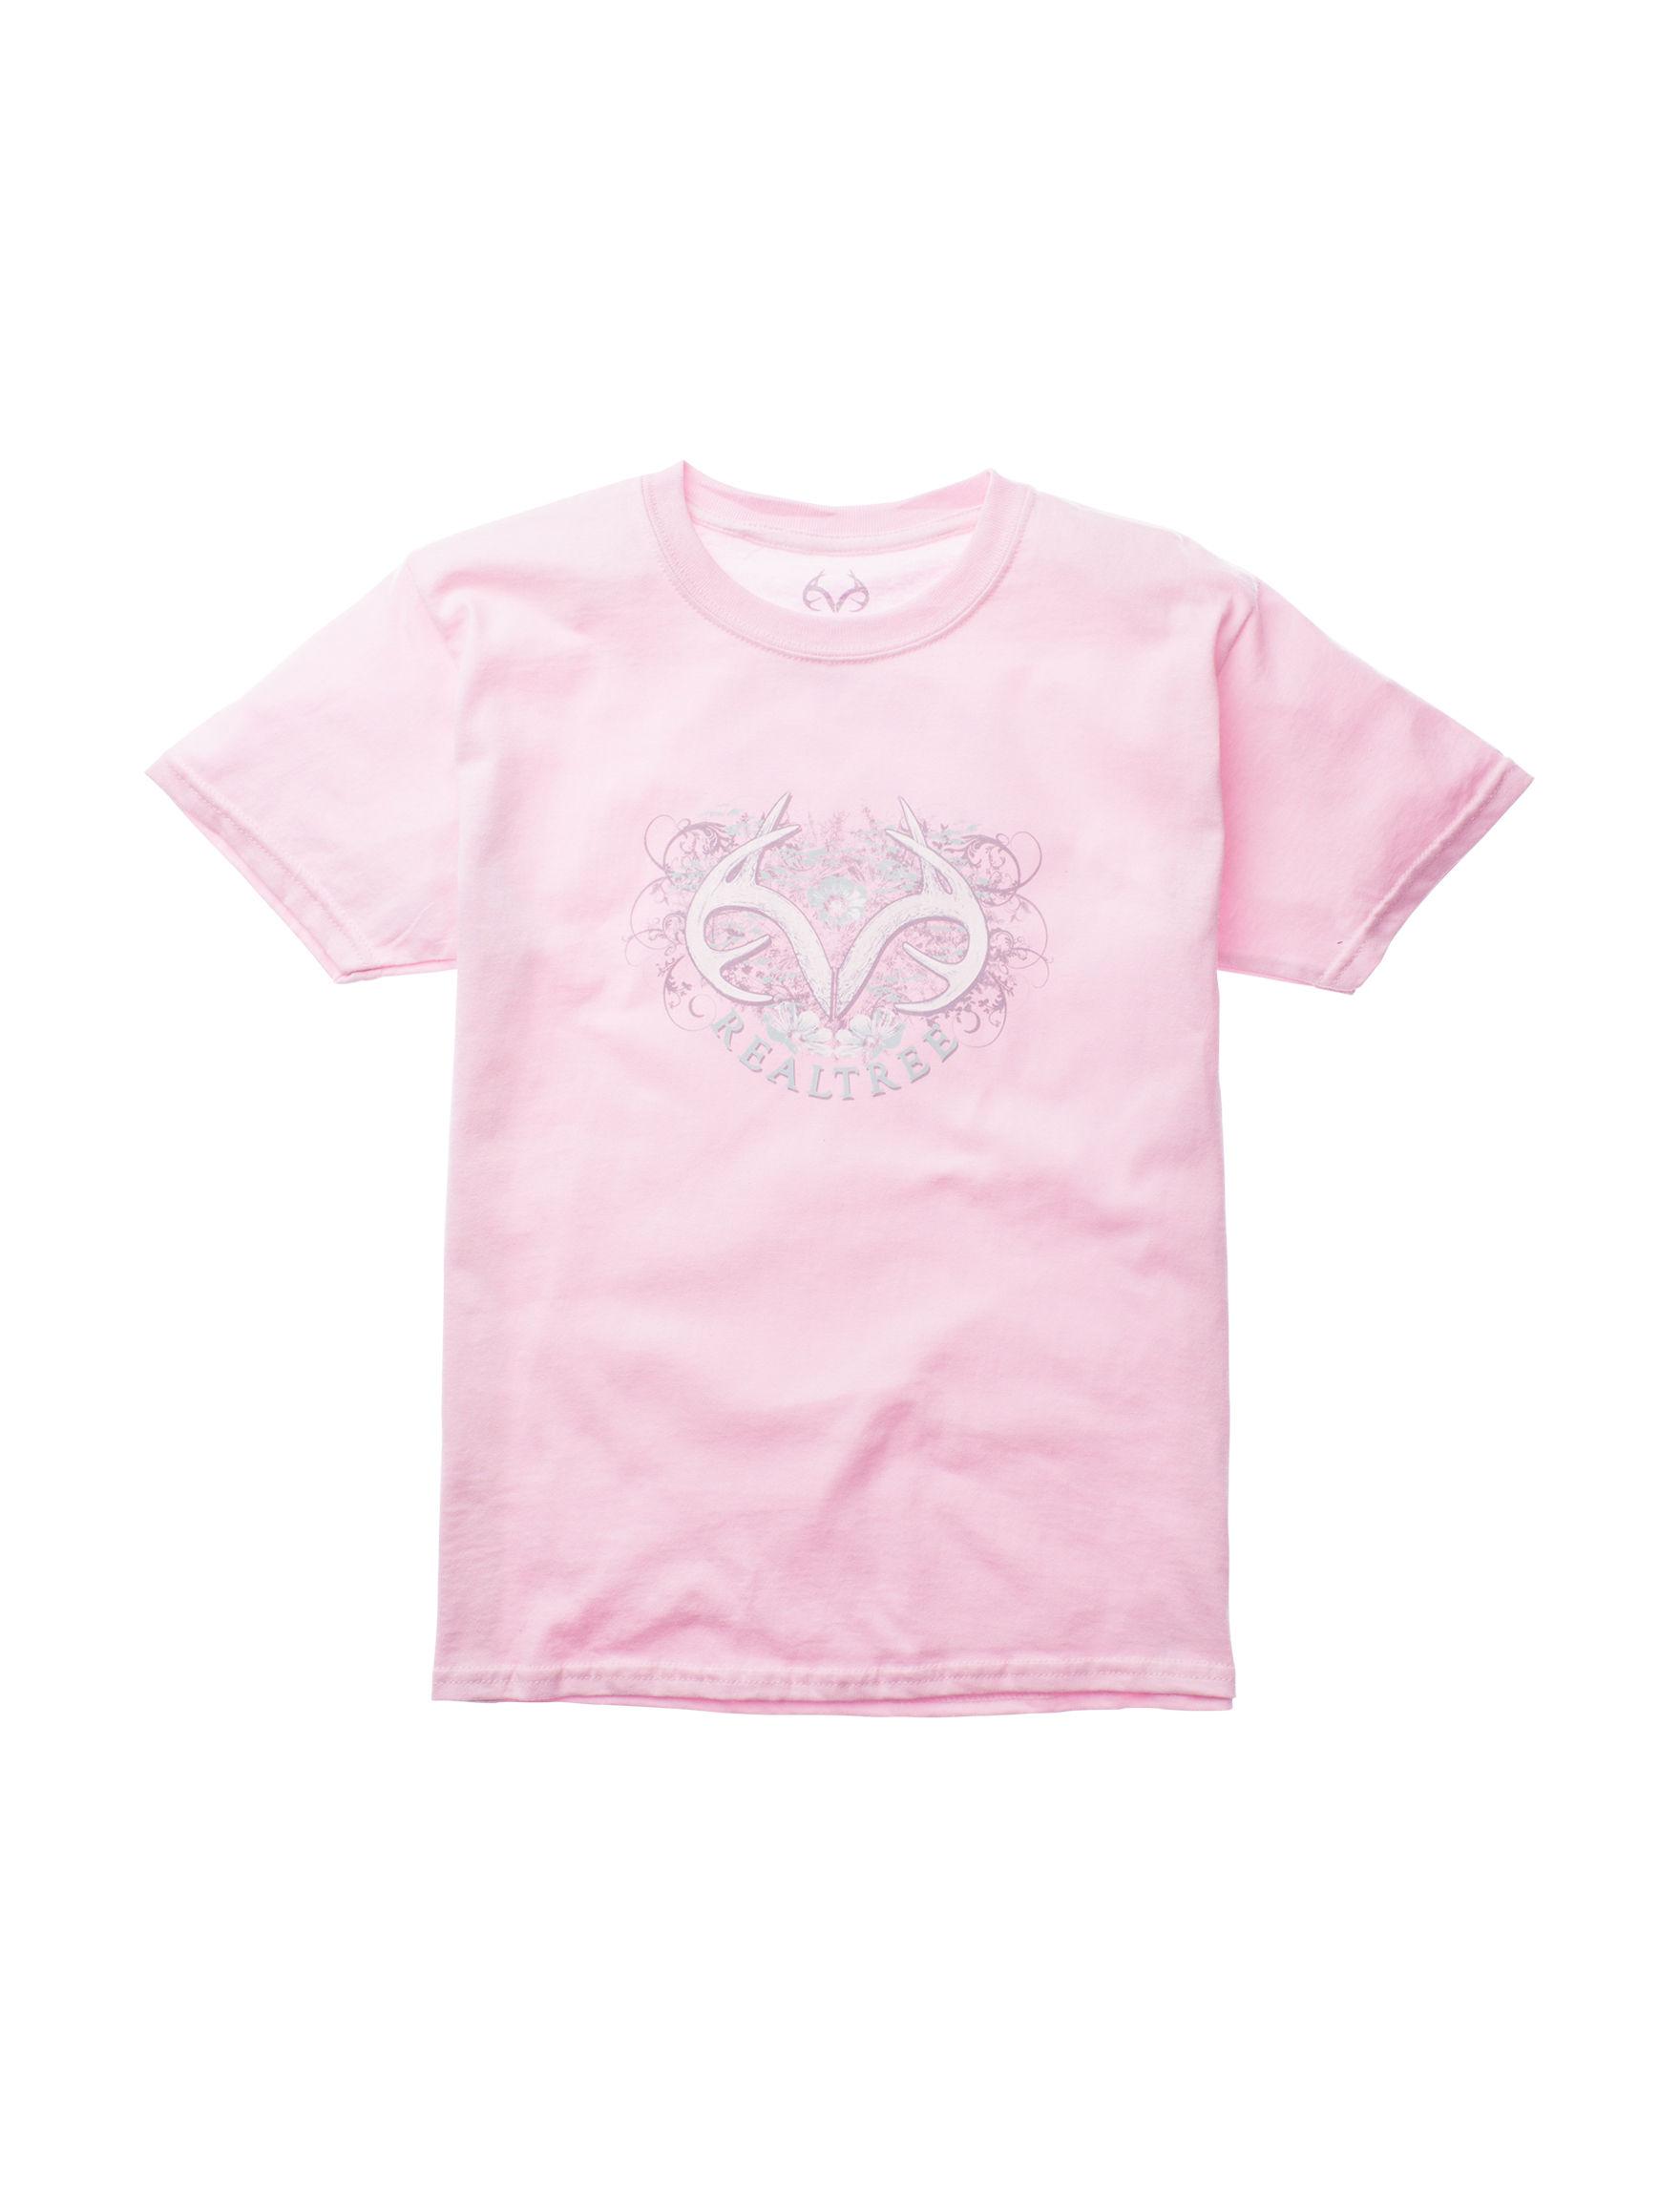 Realtree Pink Petal Tees & Tanks